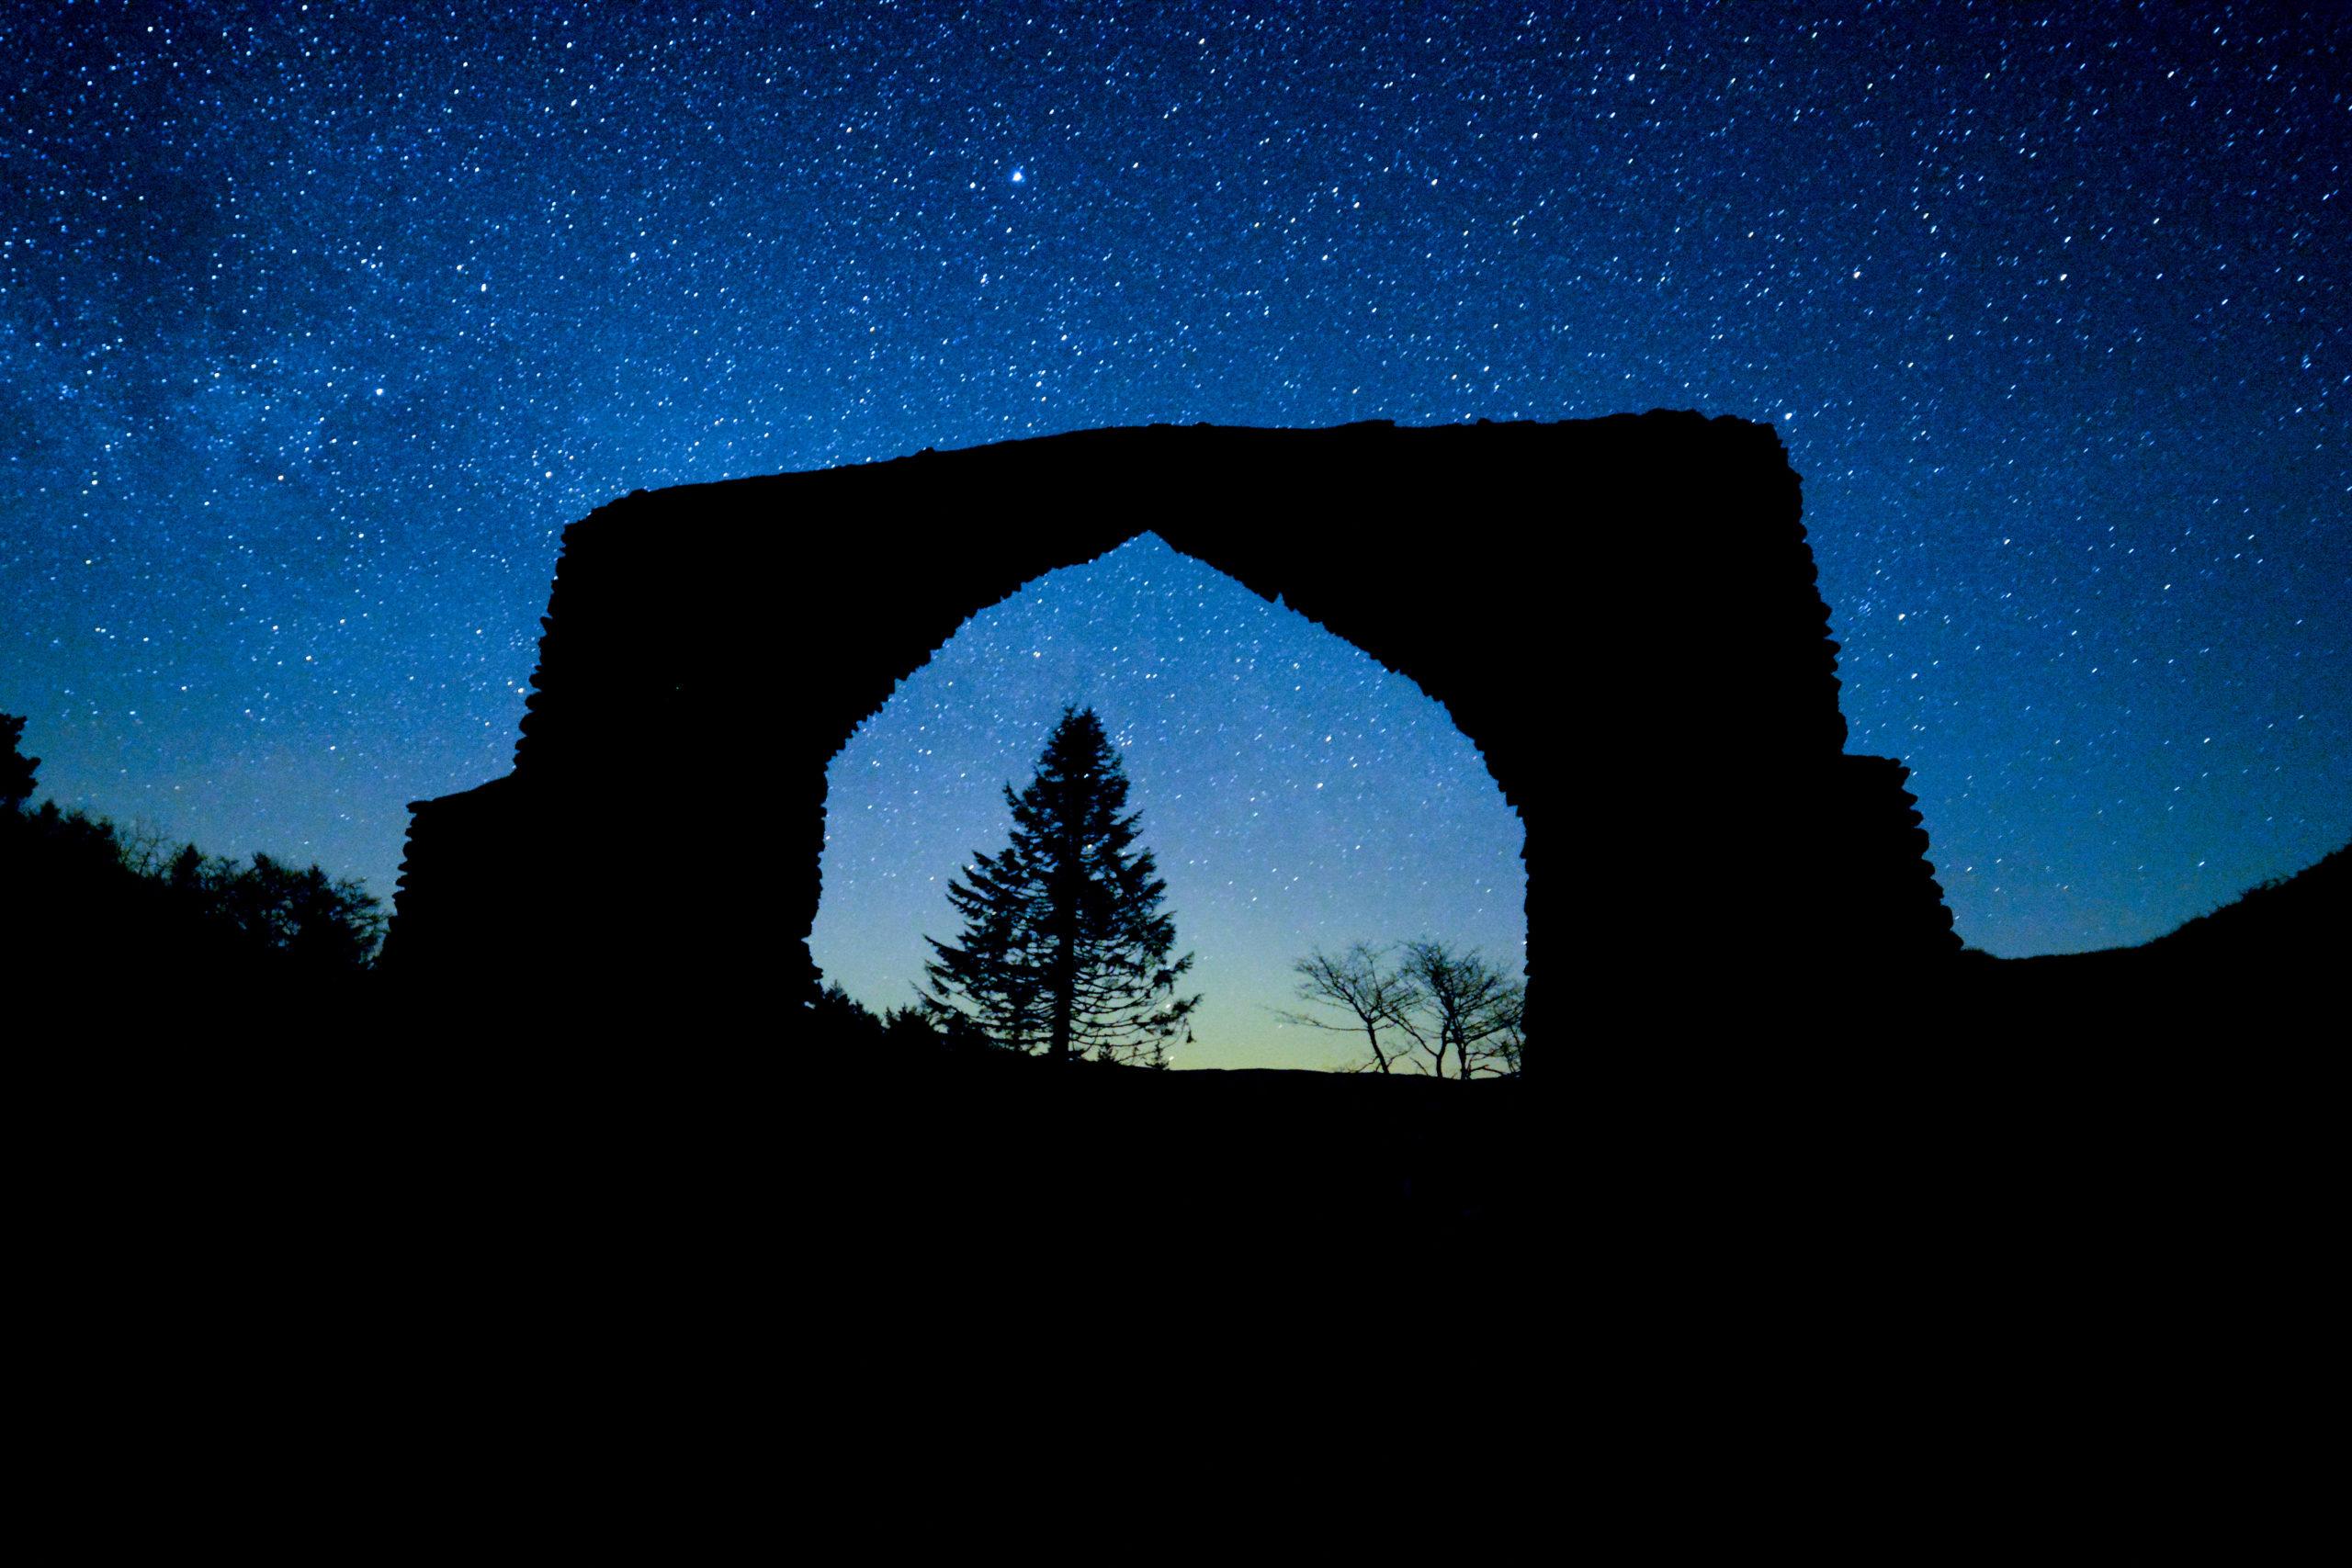 The Arch by starlight © Dafydd Wyn Morgan/Cambrian Mountains Initiative